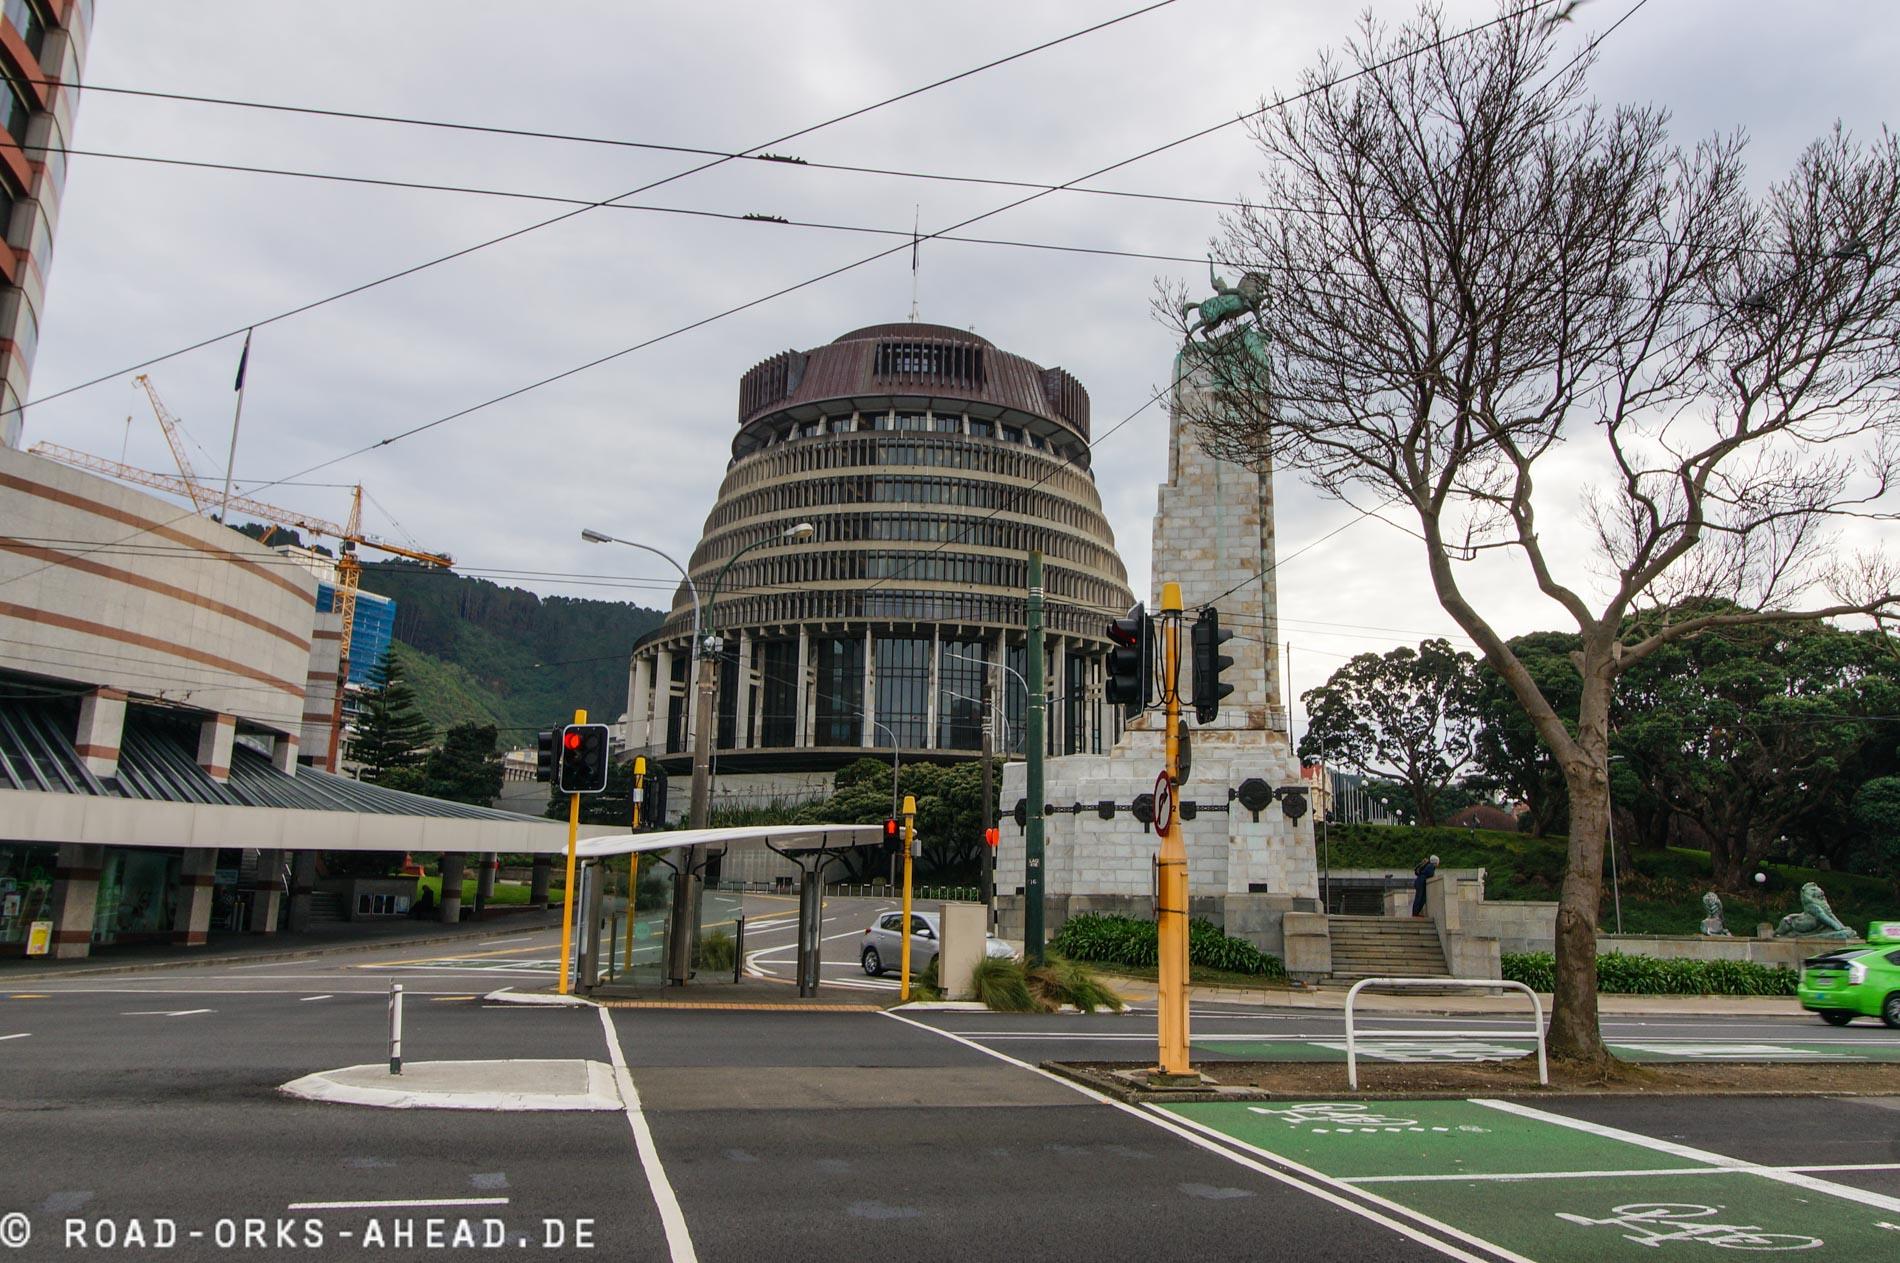 Beehive - Neuseelands Parlament